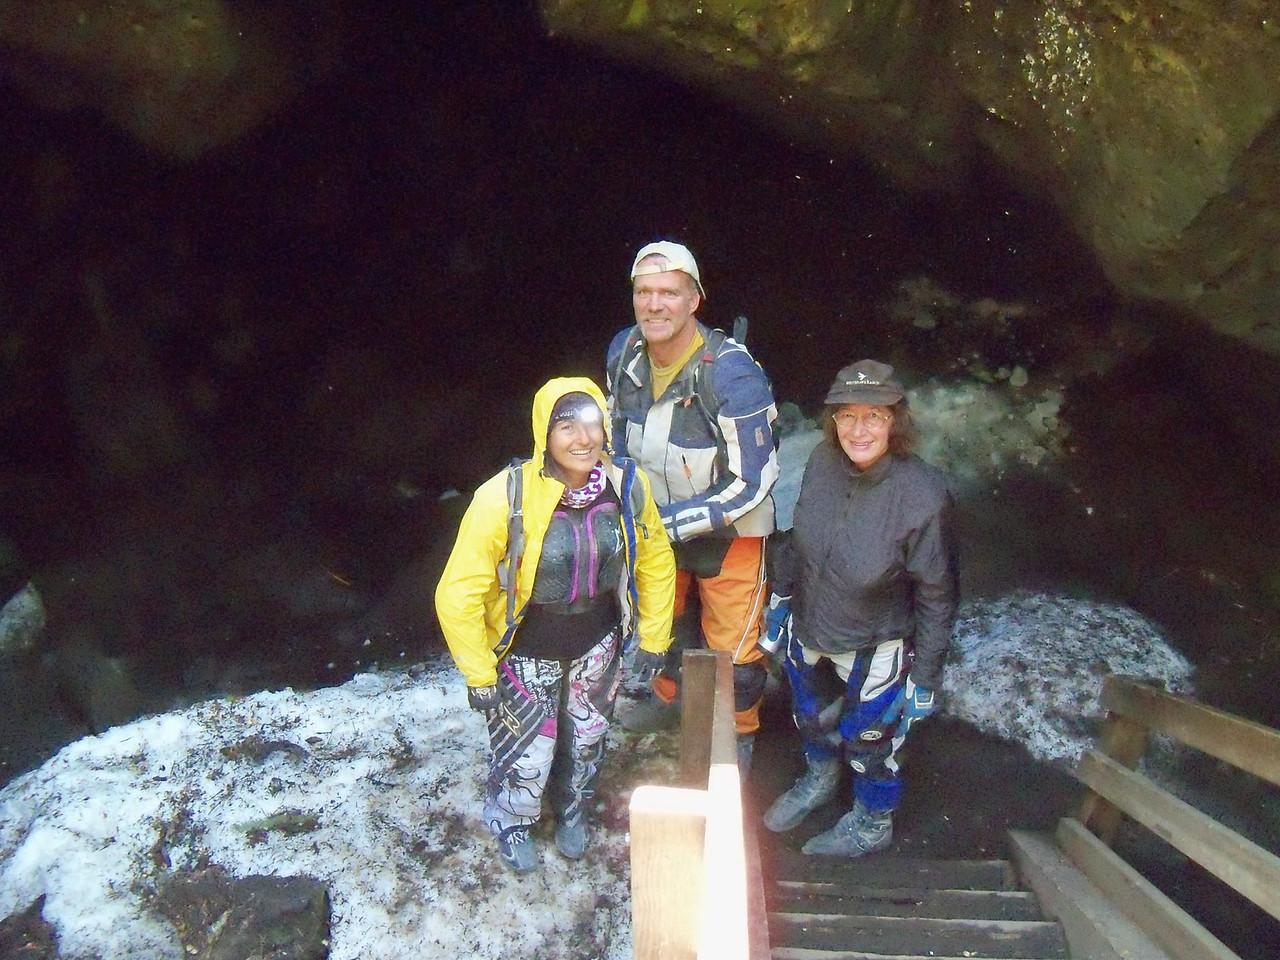 Antonella, Todd & Sylvia - I didn't last long - way too icy for me!